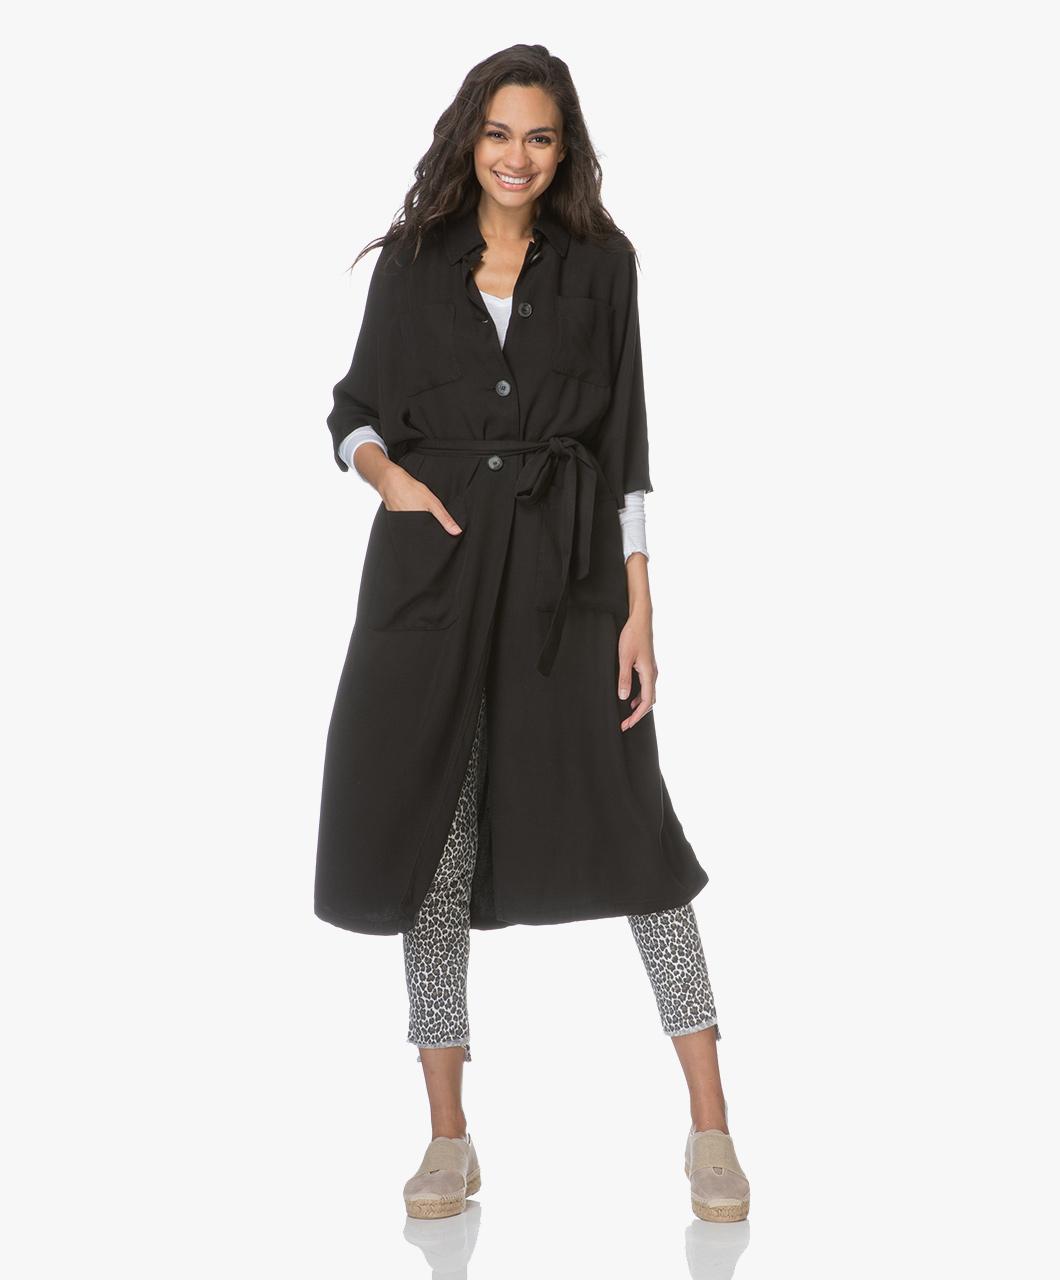 Immagine di American Vintage Coat Carbon Black Janebay Oversized Lyocell